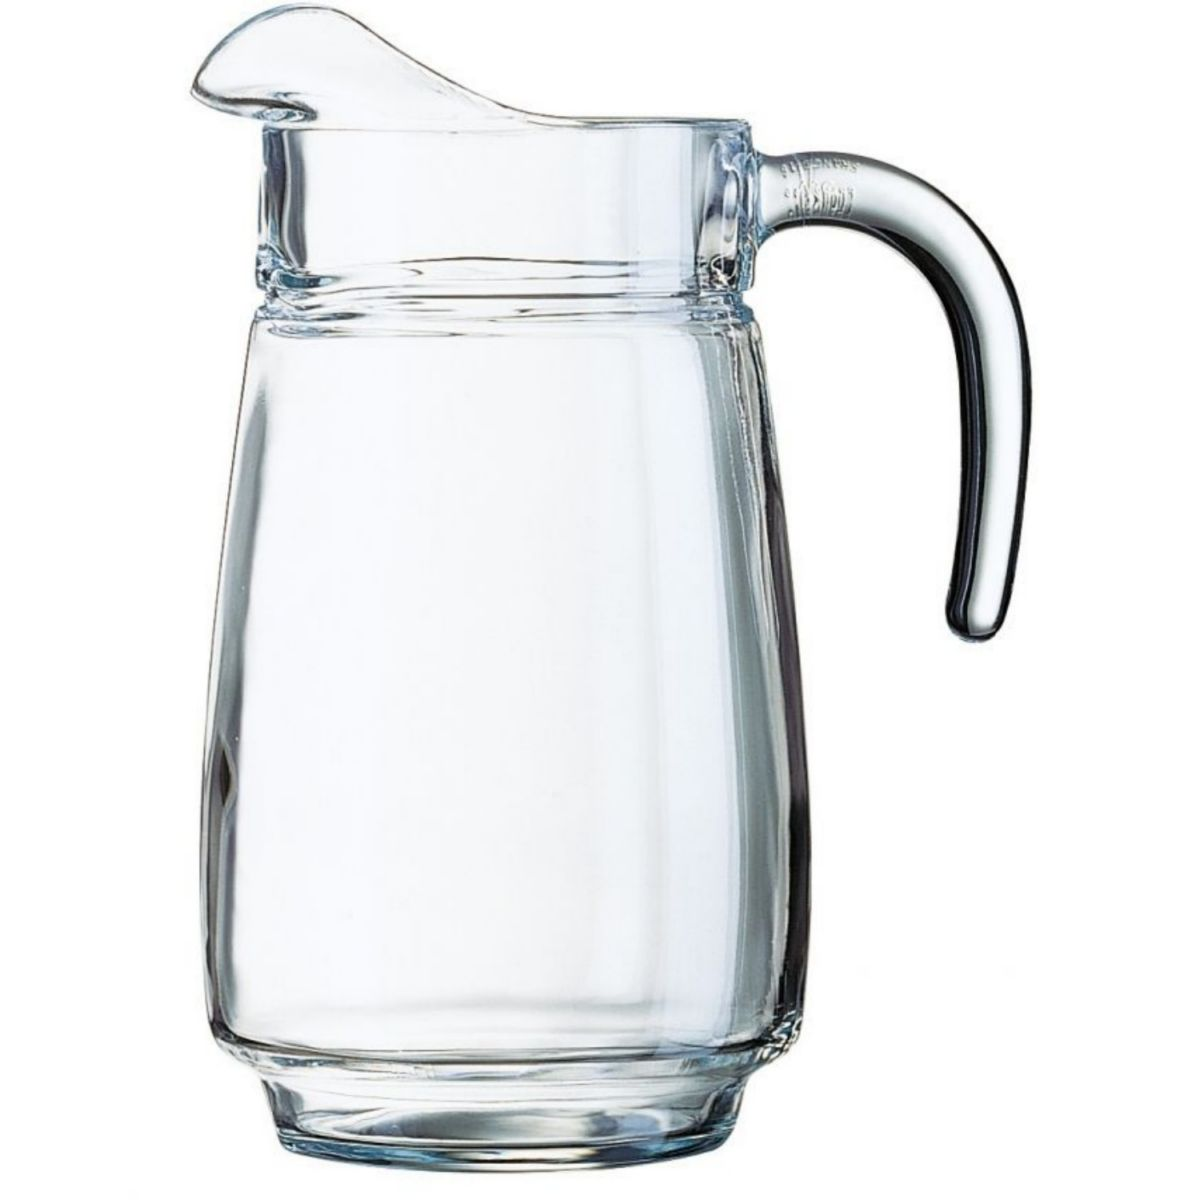 Arcoroc TIVOLI džbán 2,3 l s brzdou na led